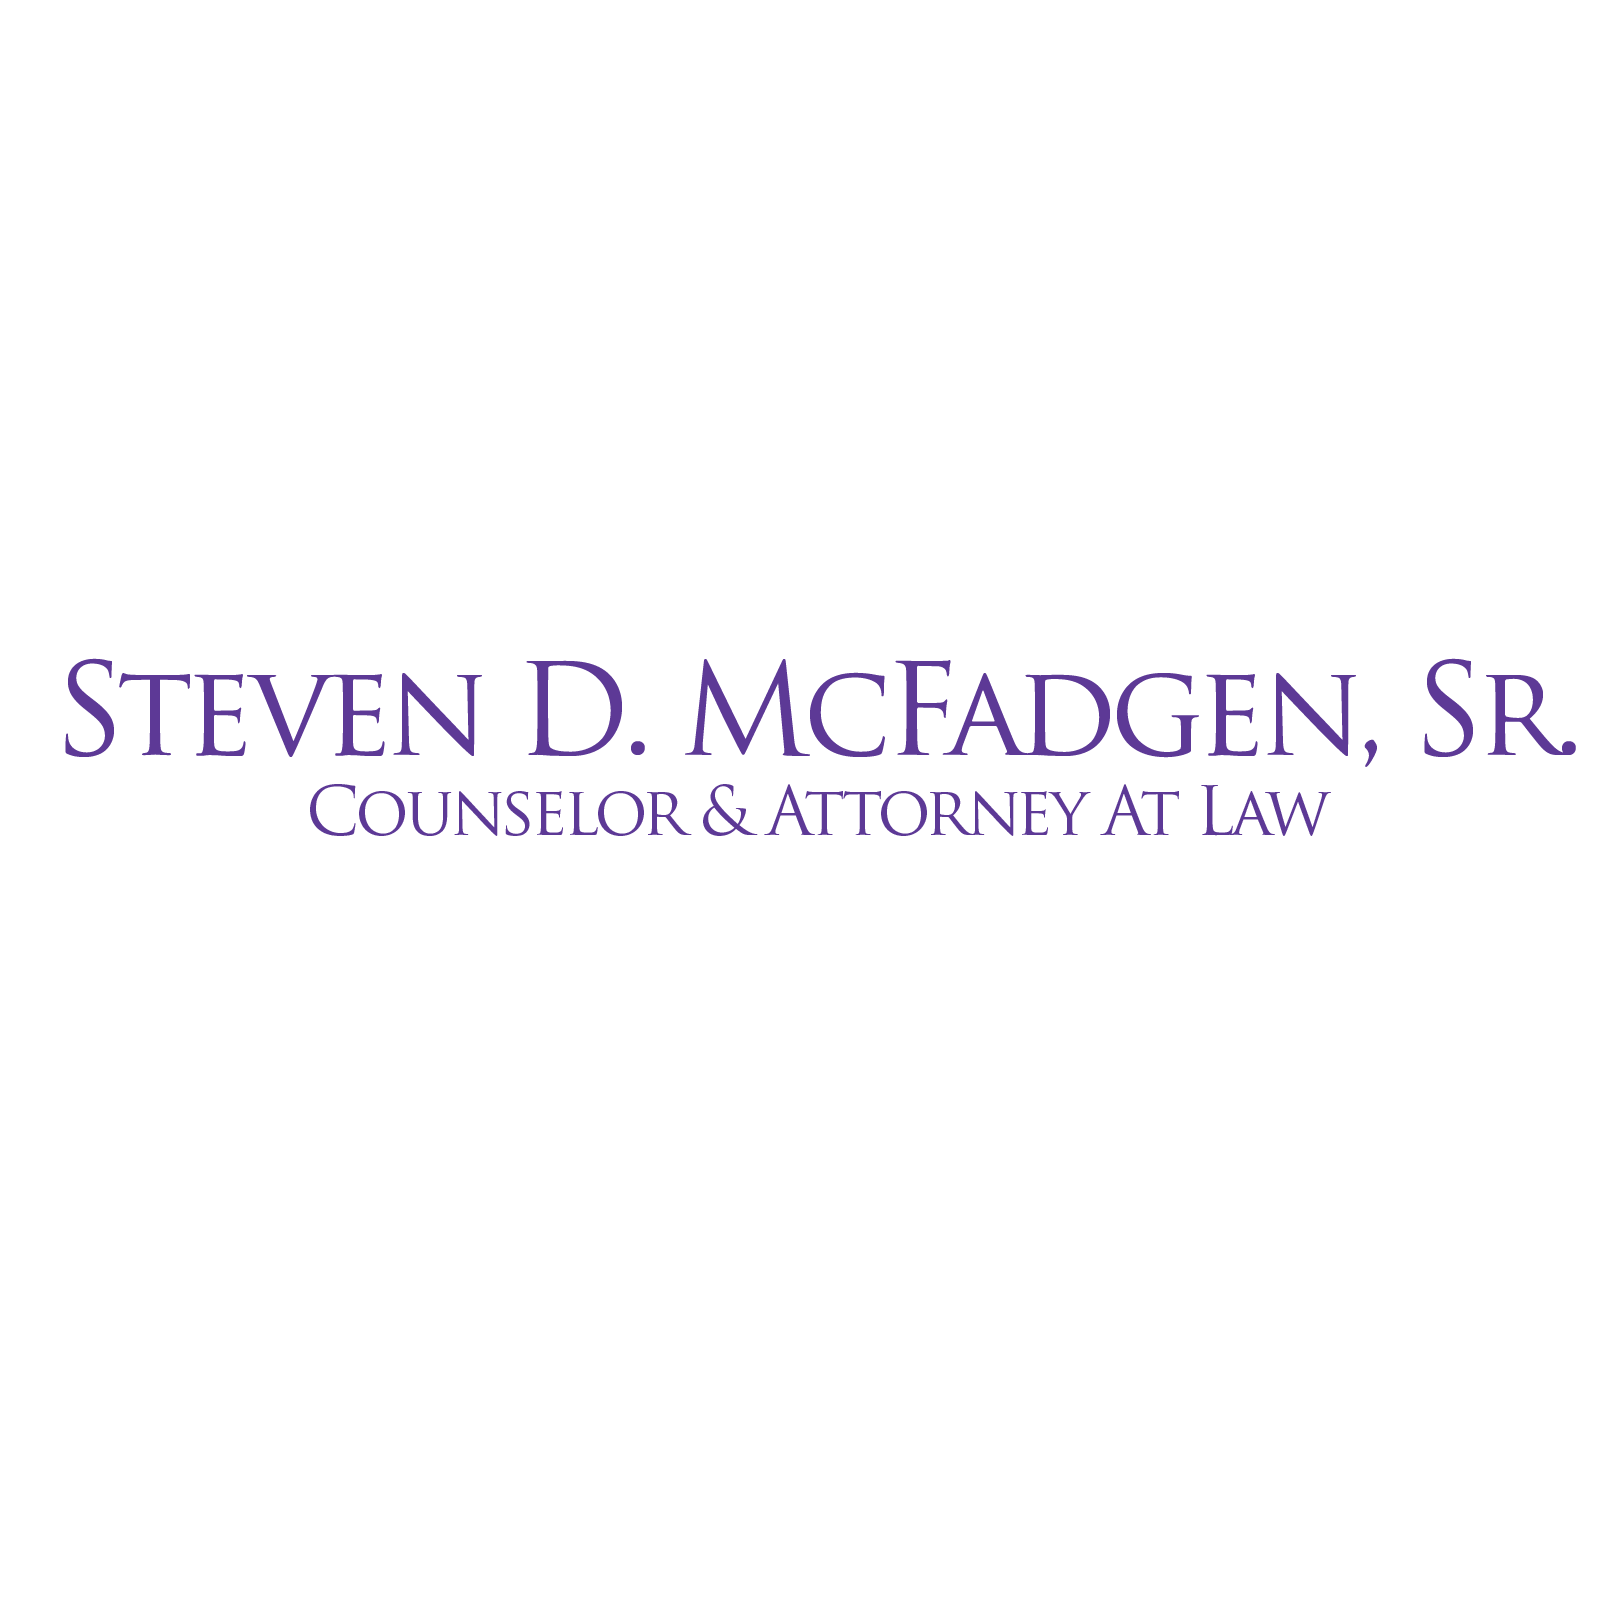 Steven D. McFadgen, Sr. Counselor & Attorney At Law